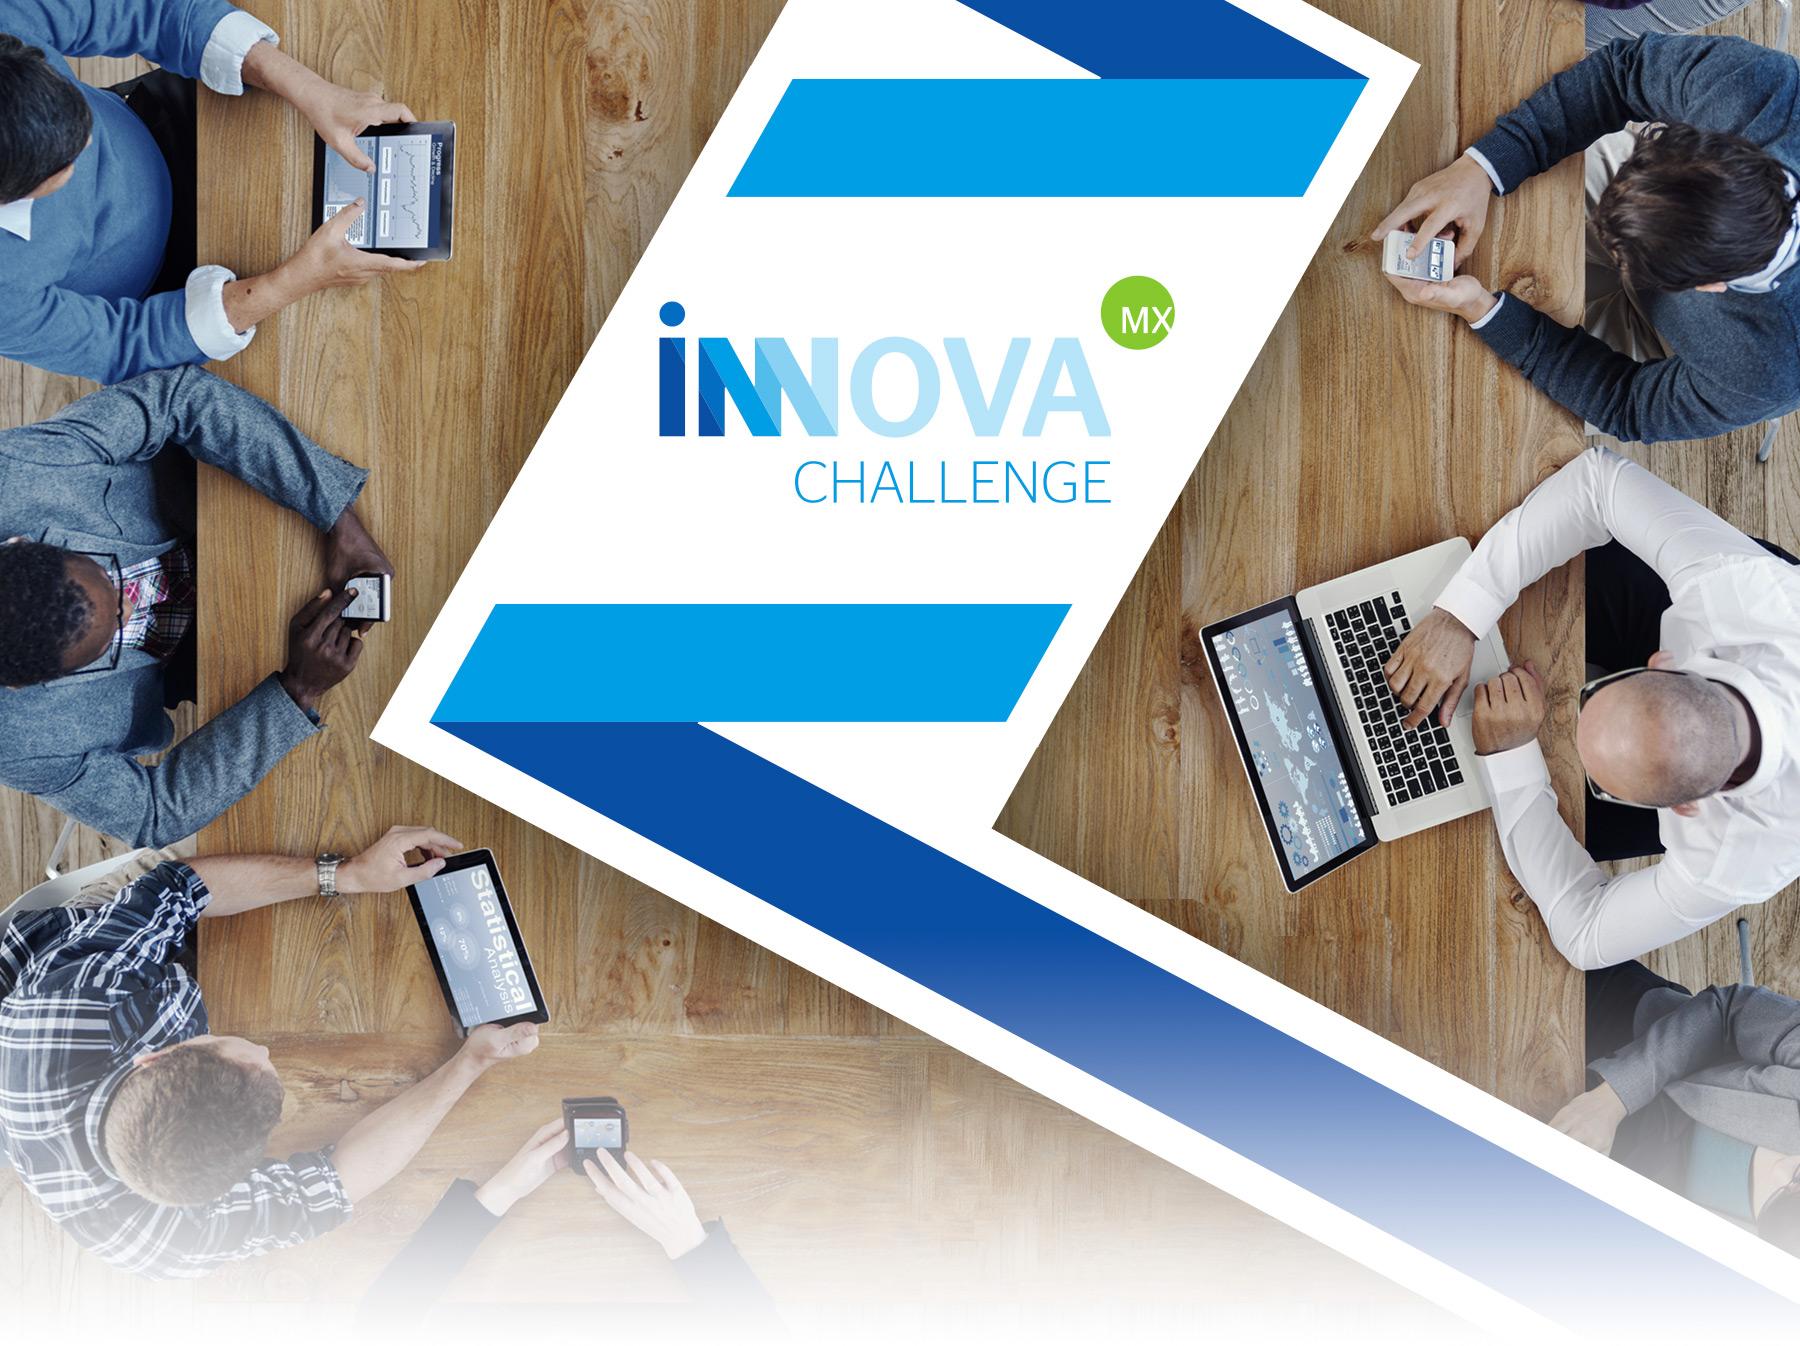 InnovaChallenge MX in New York: Geospatial analysis of financial data